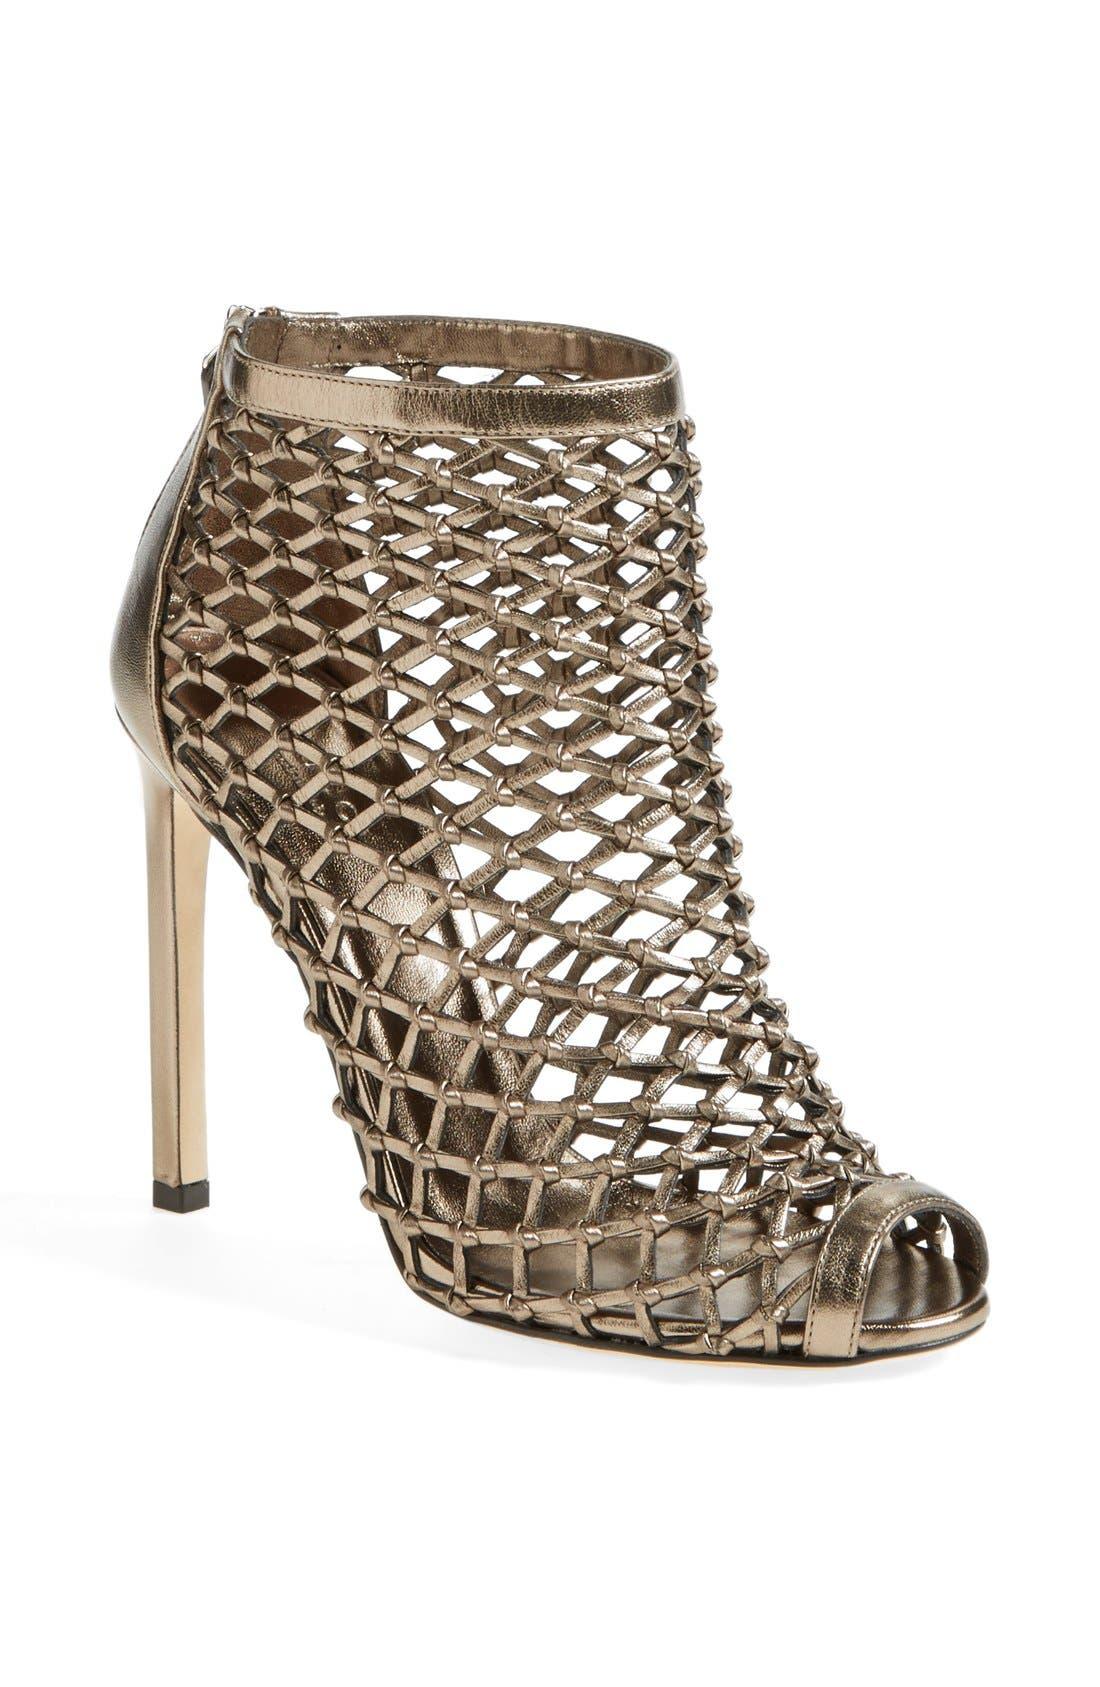 Main Image - Gucci 'Eline' Studded Cage Open Toe Sandal